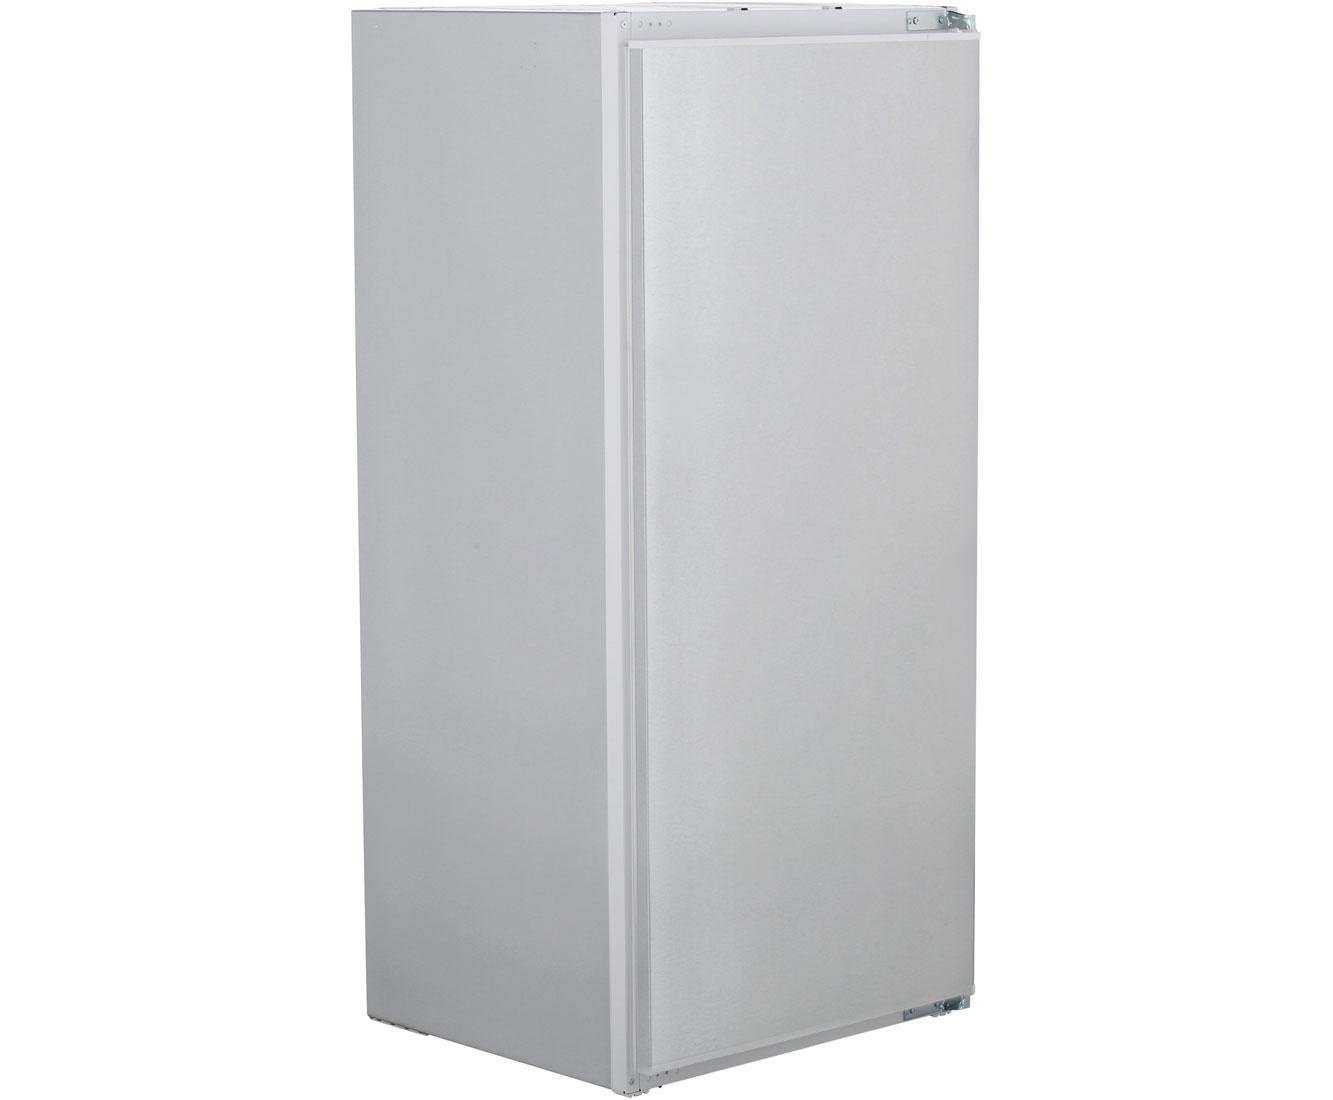 Mini Kühlschrank Für Tetrapack : Mini kühlschrank vergleich minikühlschrank